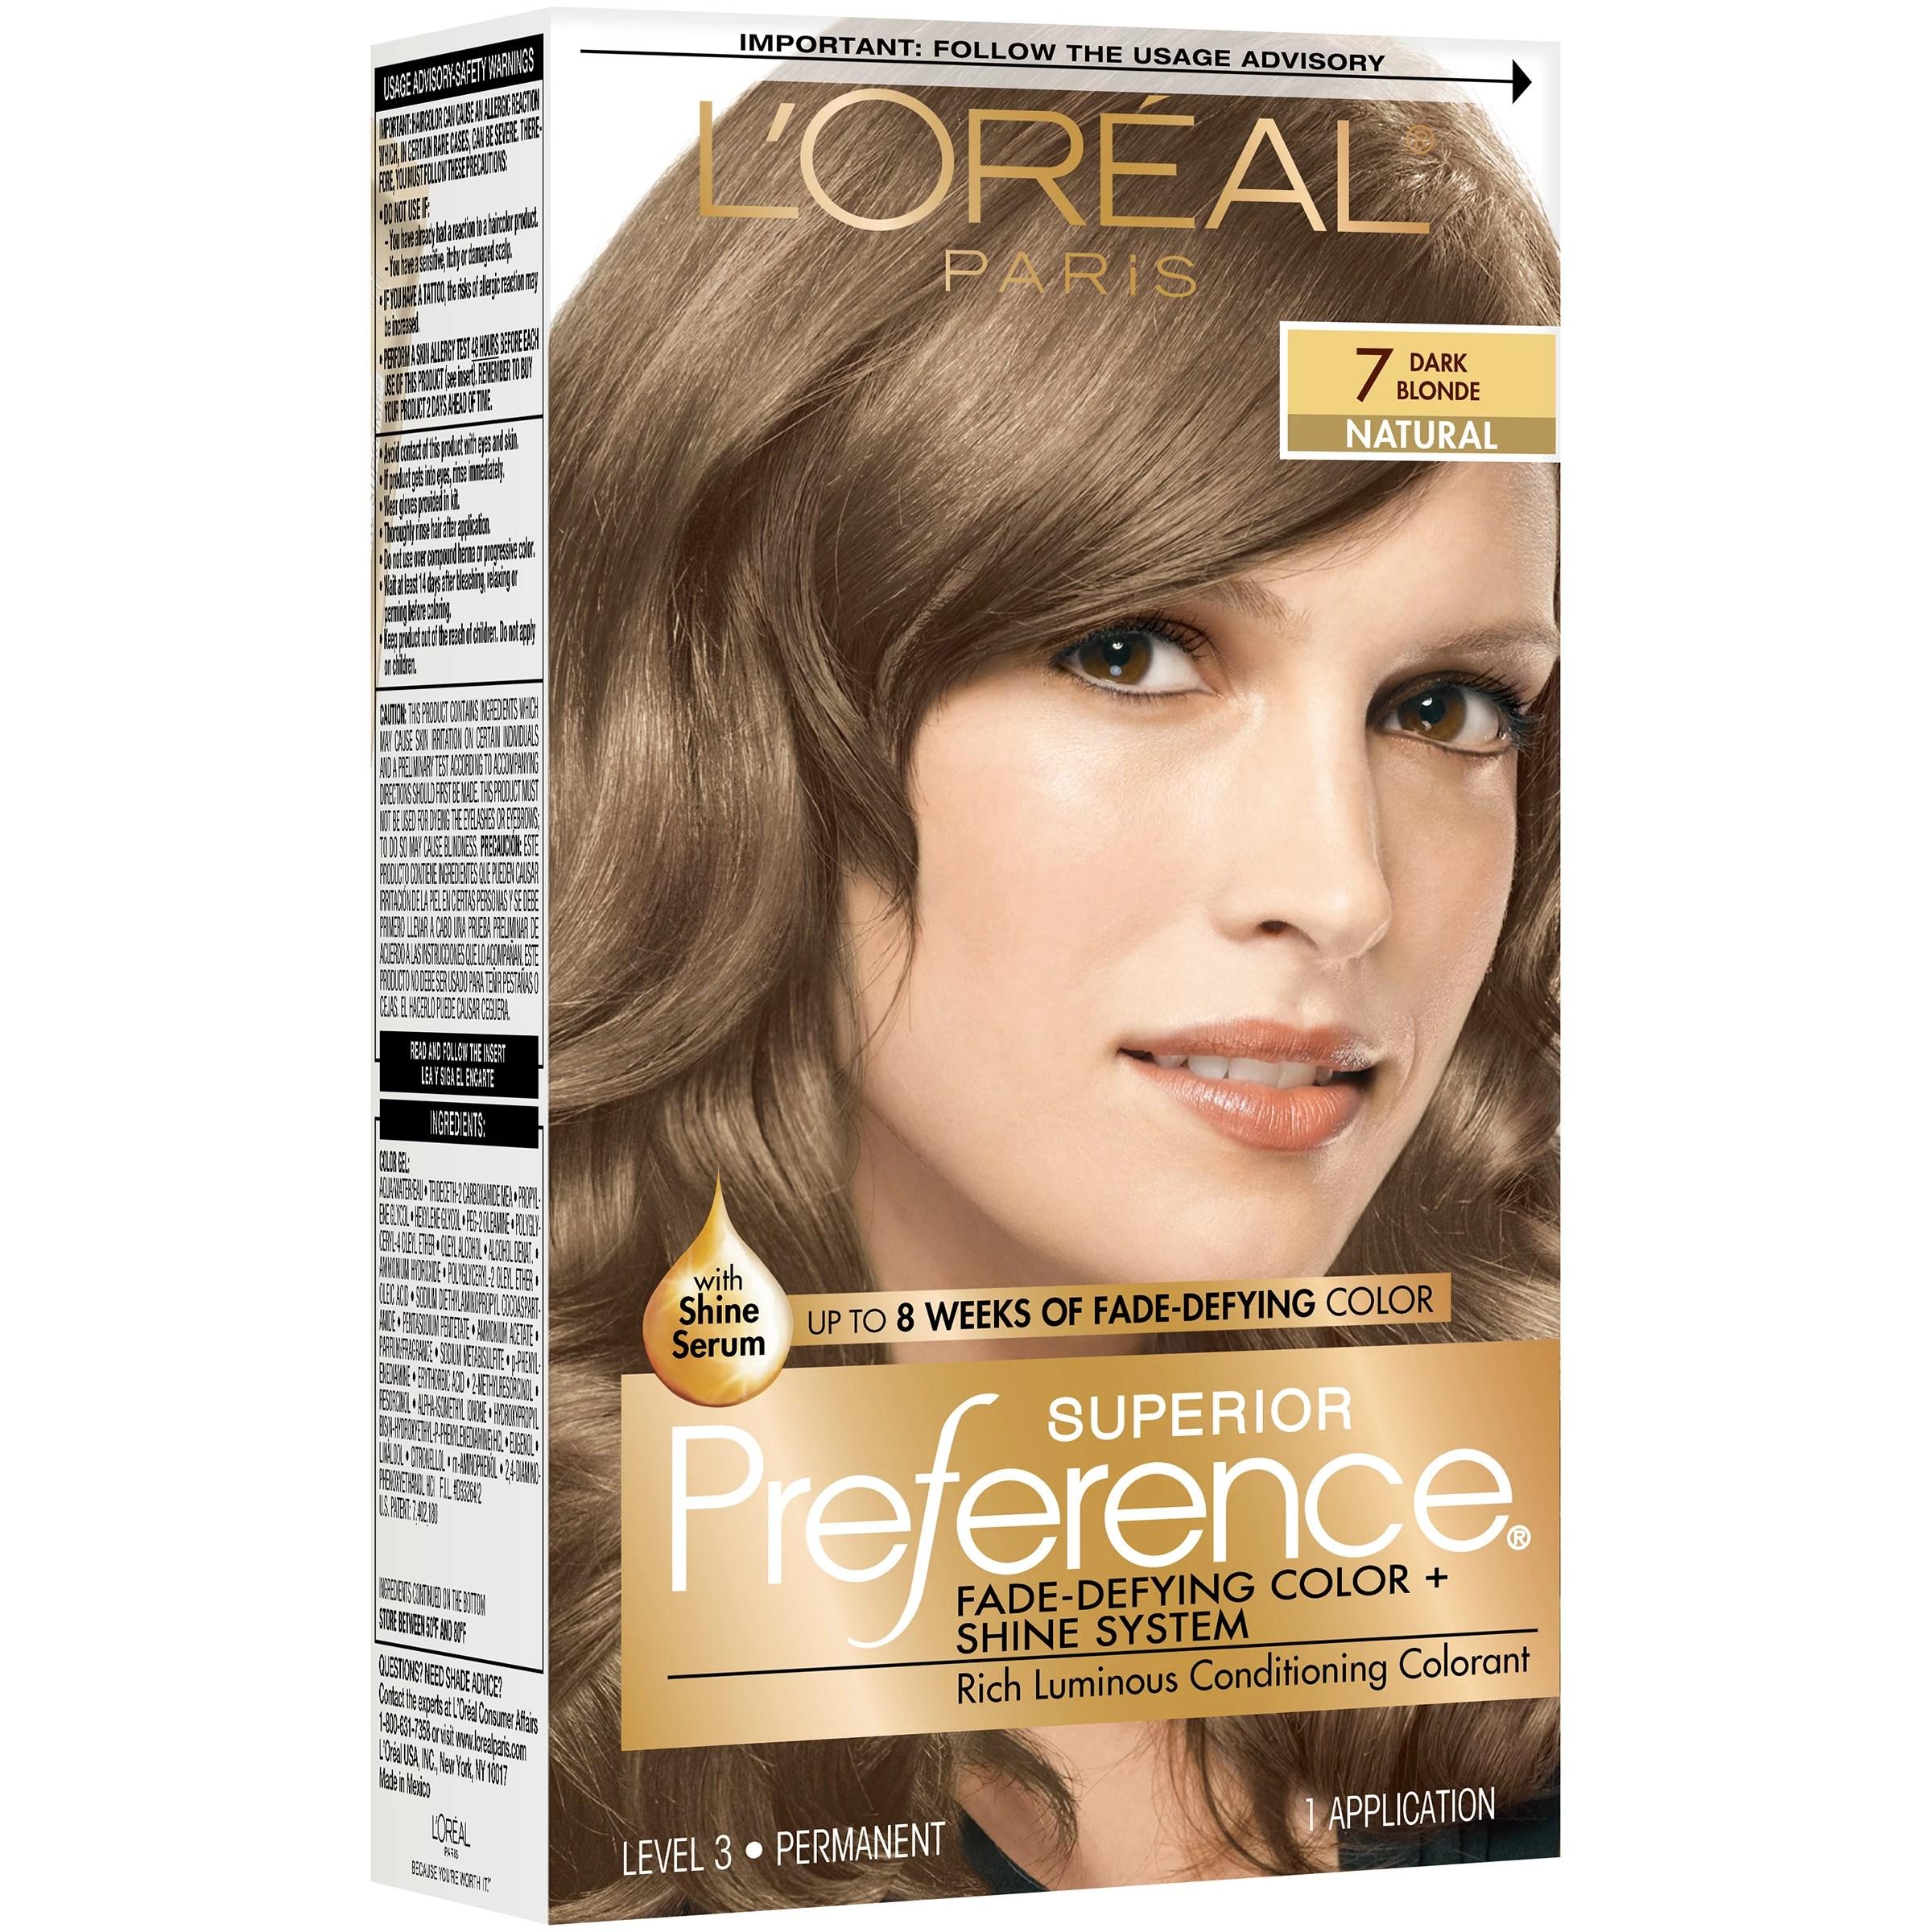 L Oreal Paris Superior Preference Permanent Hair Color 7 Dark Blonde Shop Hair Color At H E B